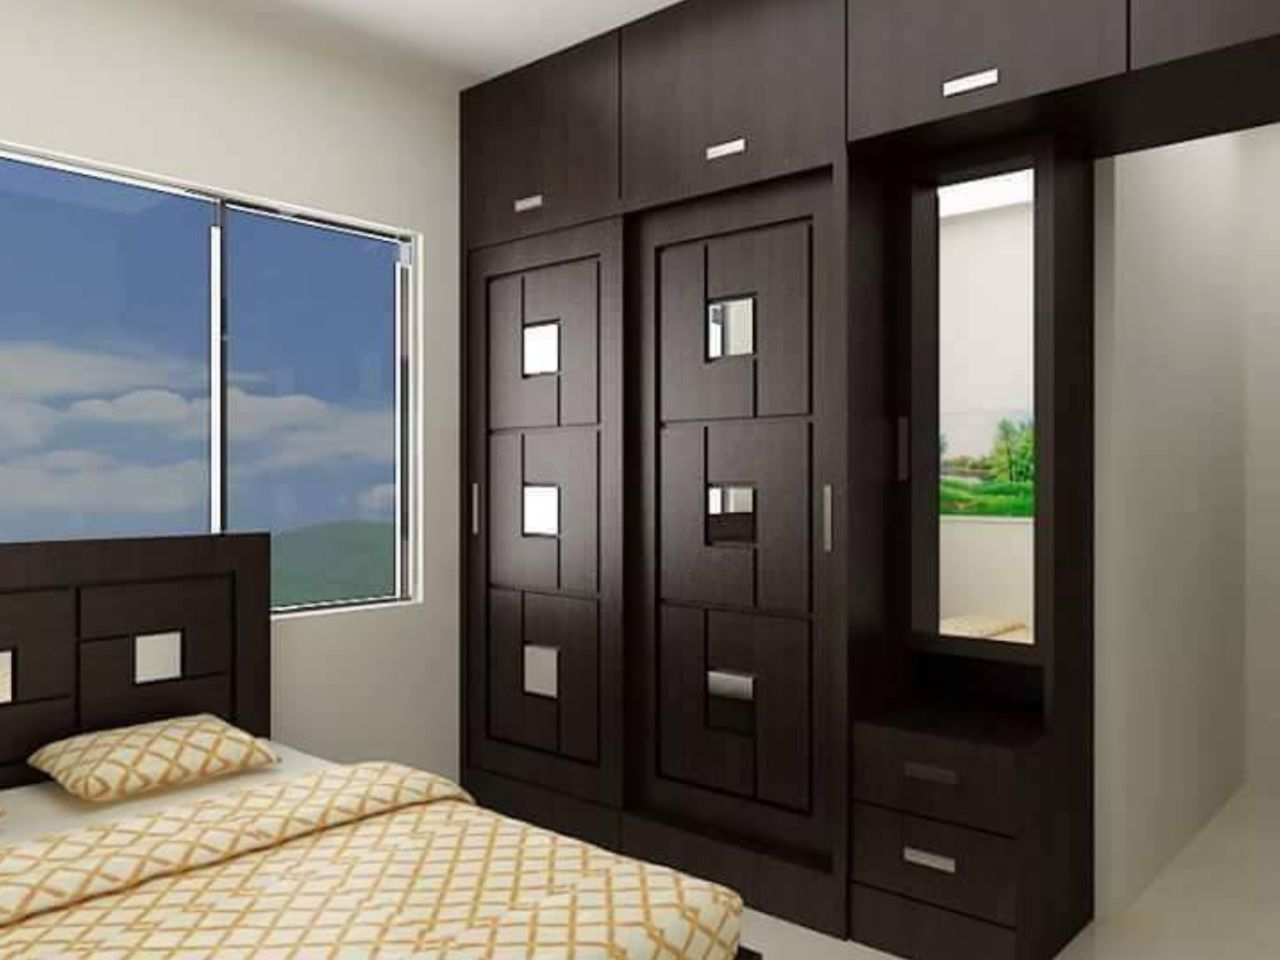 Closet modernos y elegantes